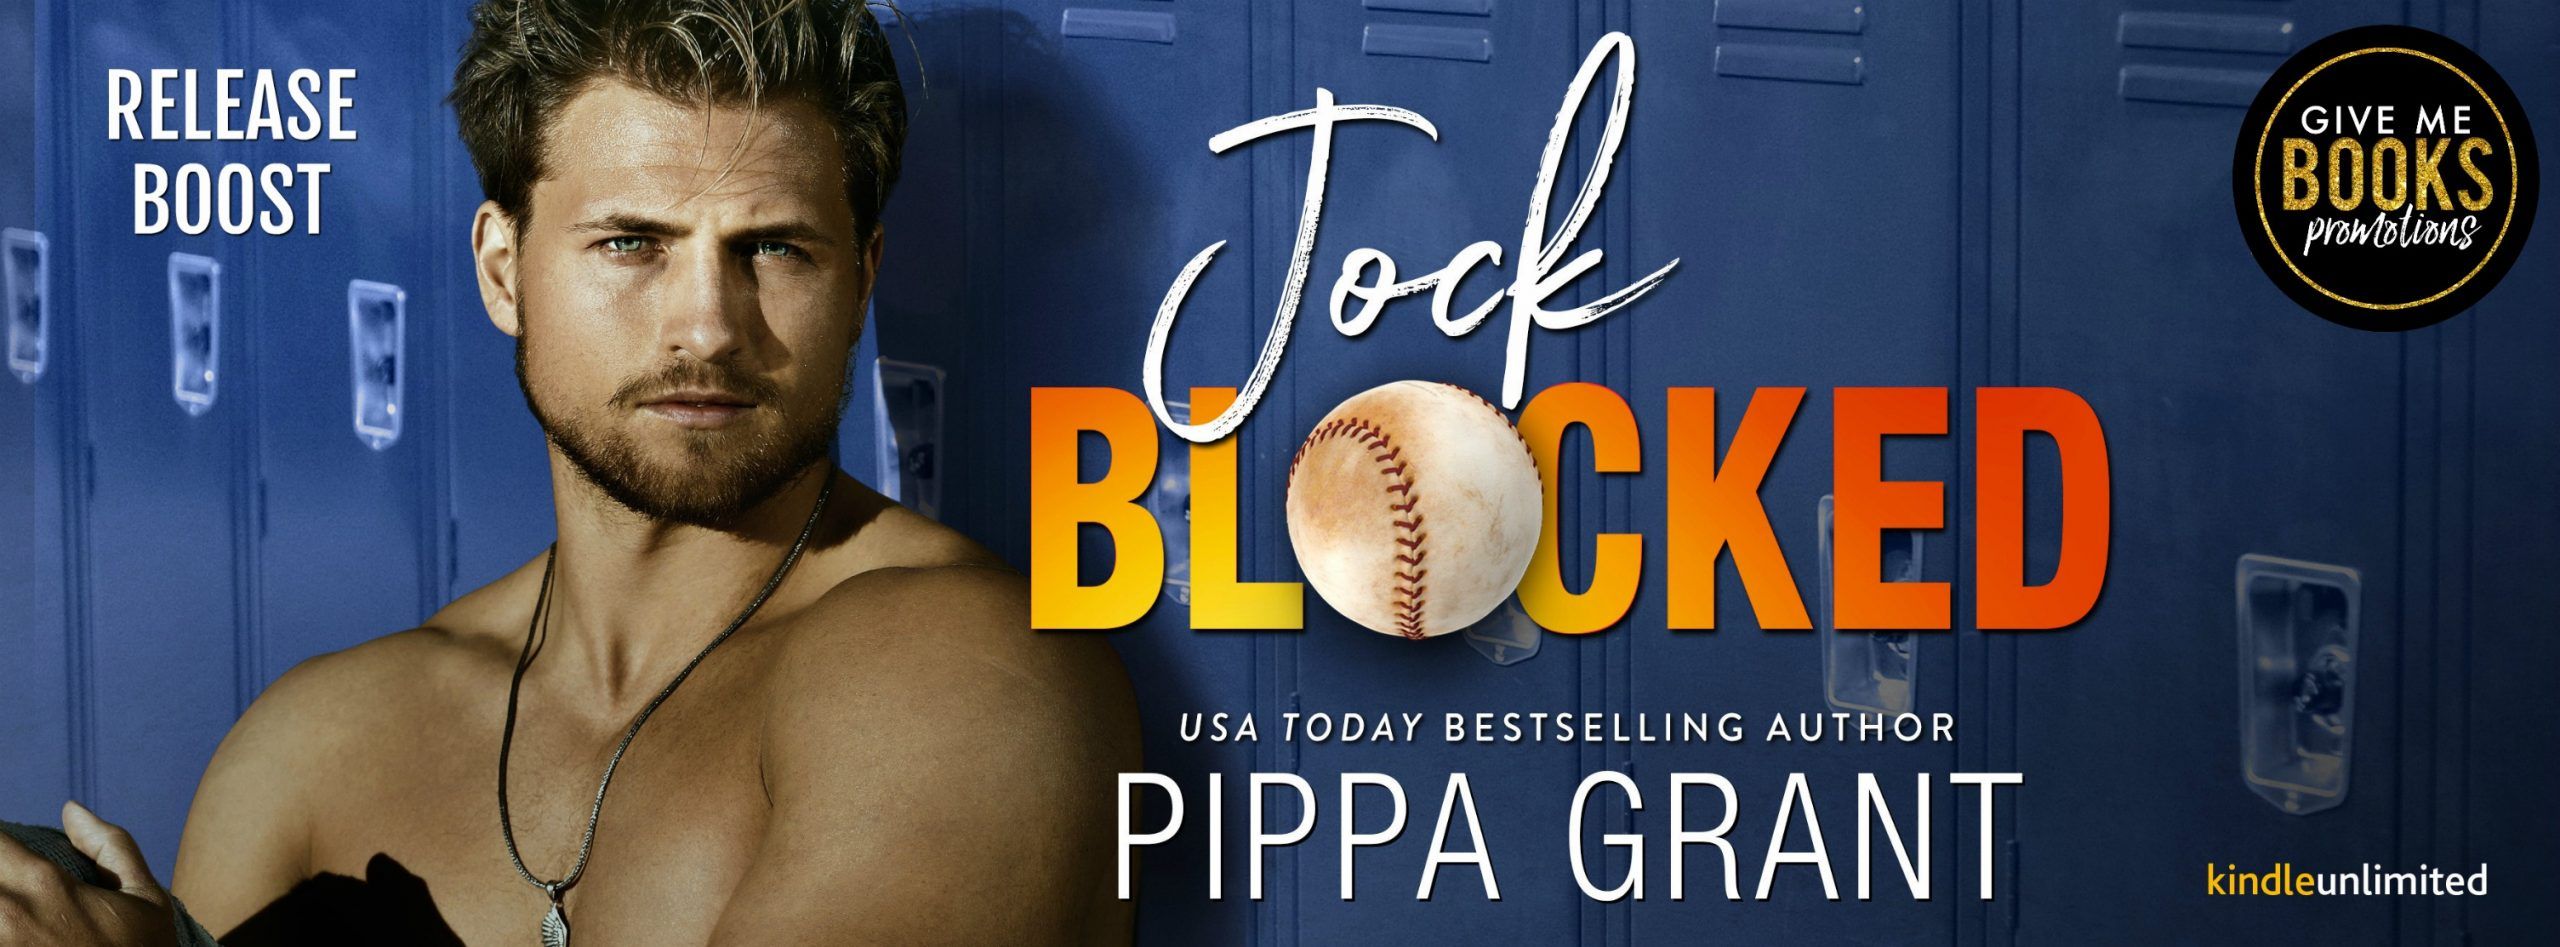 Release Boost: Jock Blocked by Pippa Grant